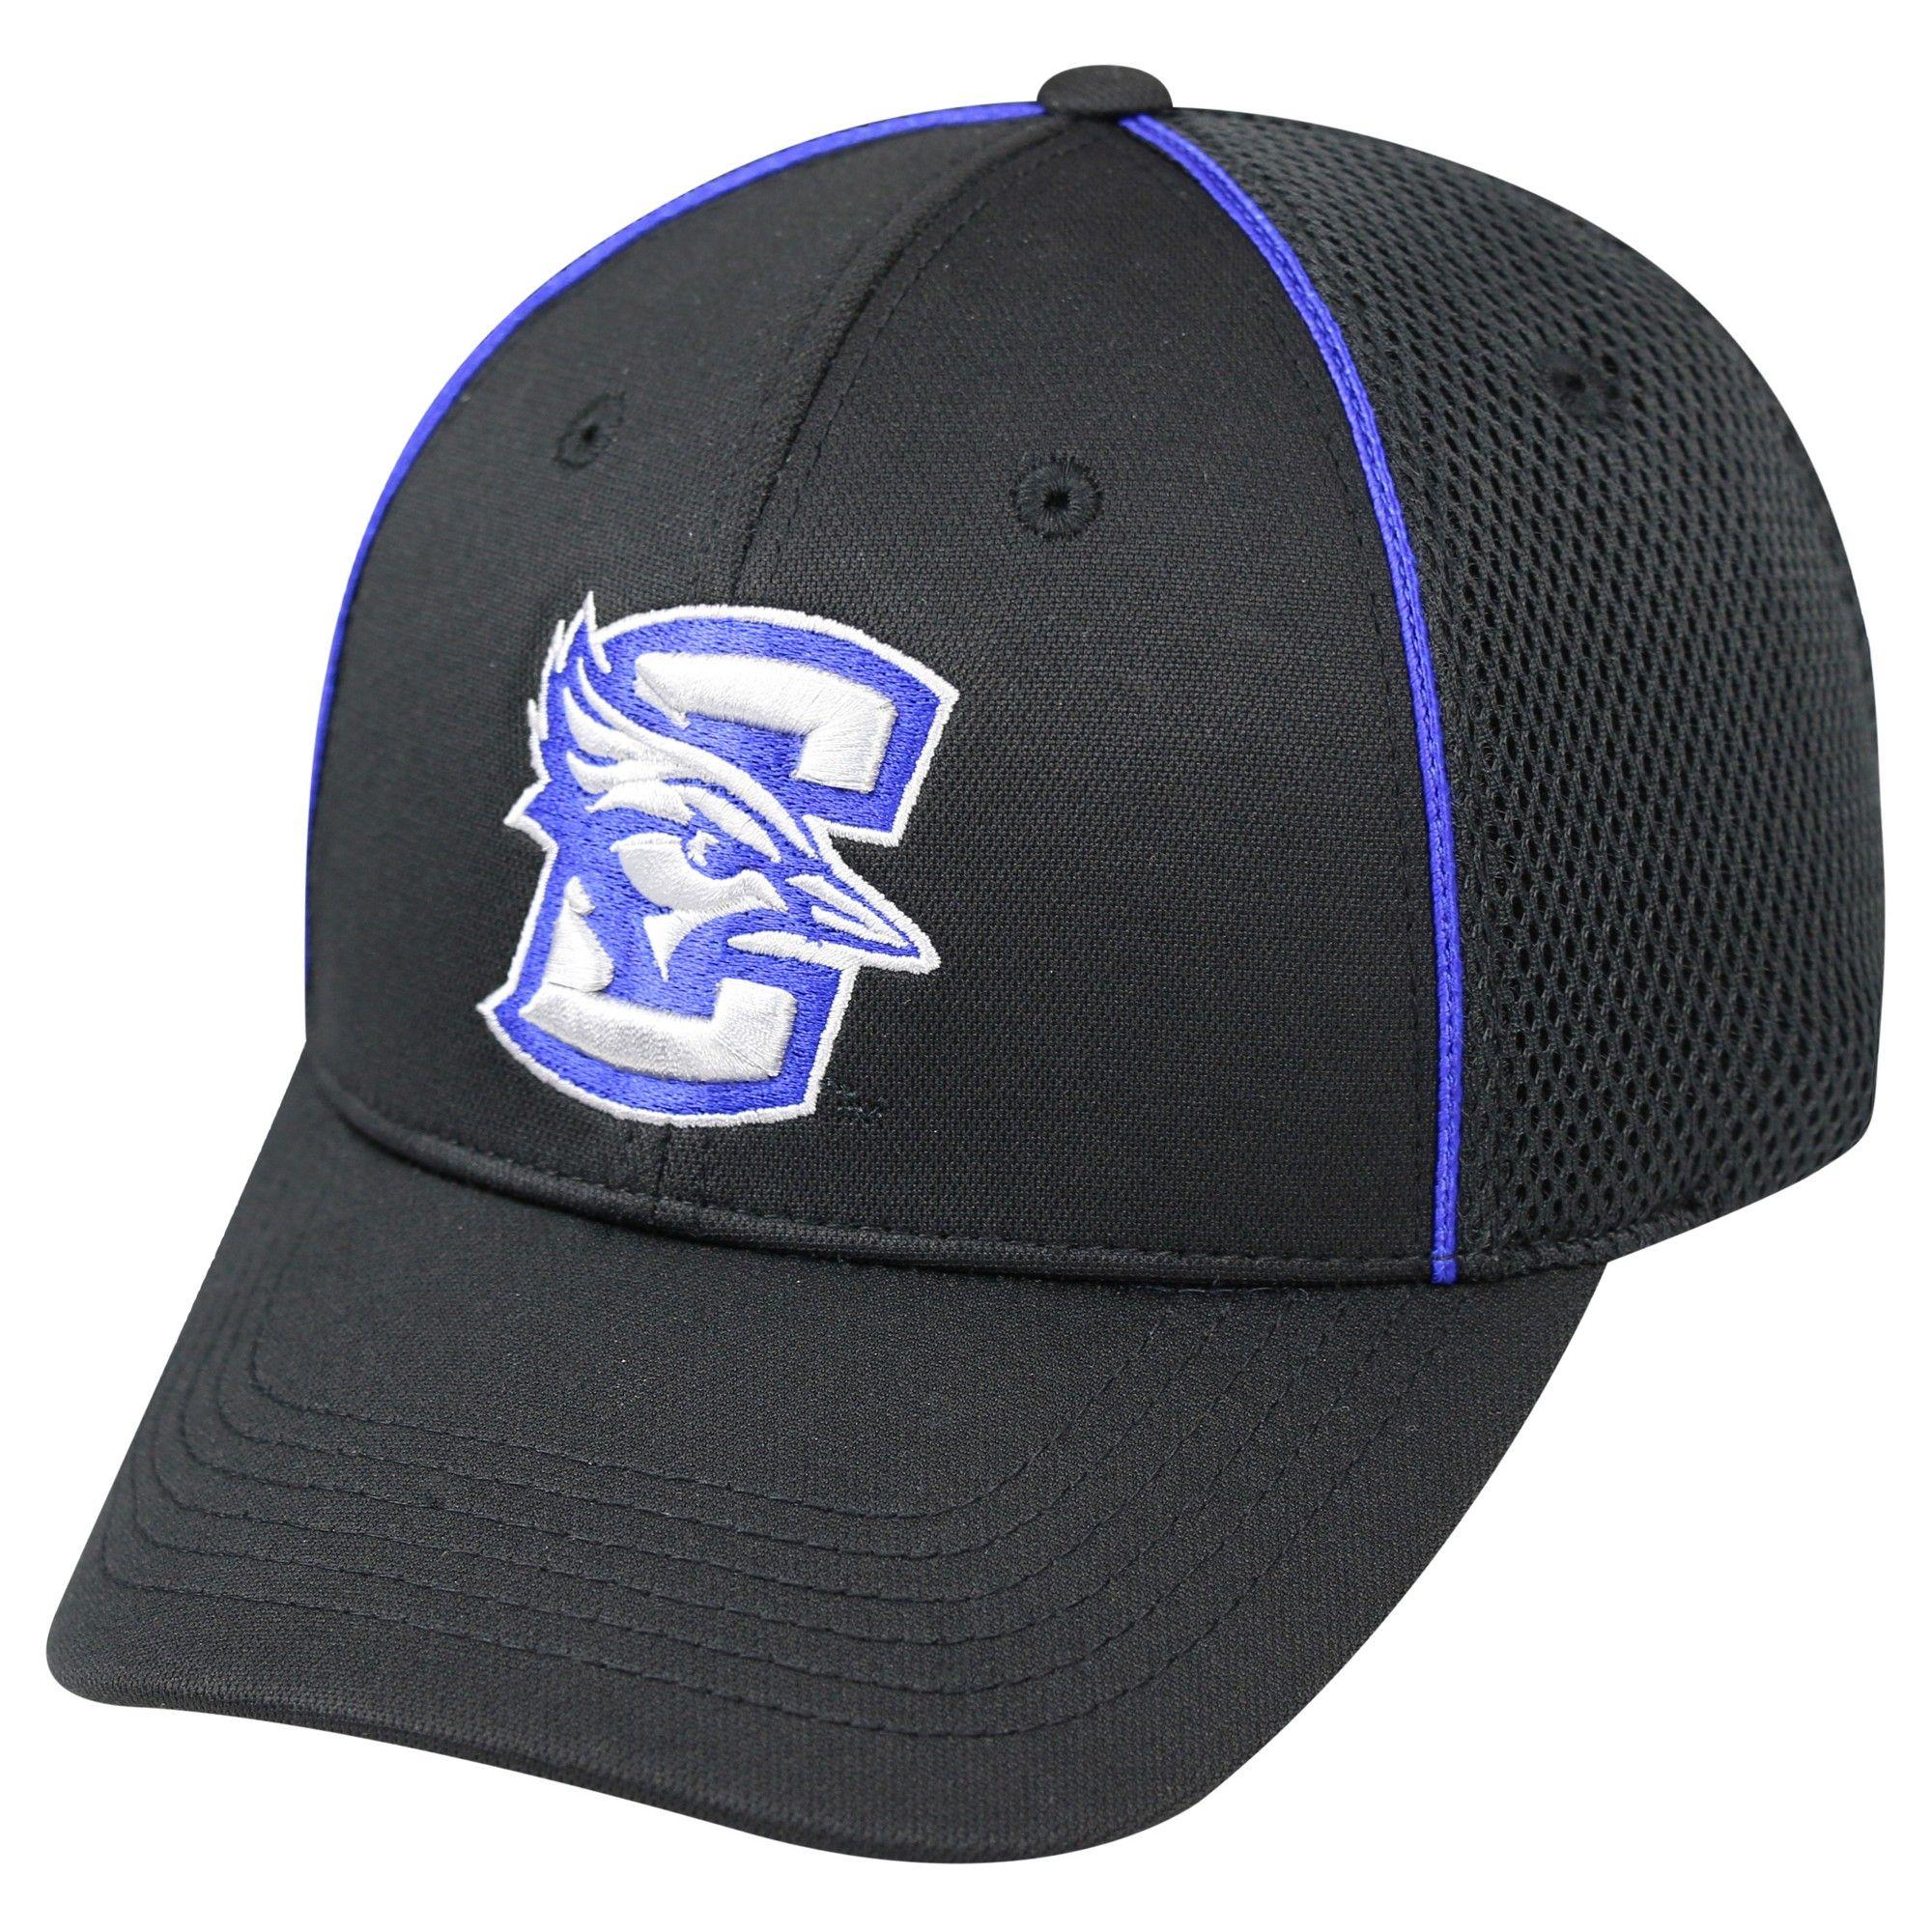 ea8dea5fea5bc cheap creighton nike campus hat adjustable 7c74a 2675e  sale ncaa baseball  hats creighton bluejays black mens 2e53f 0bacd